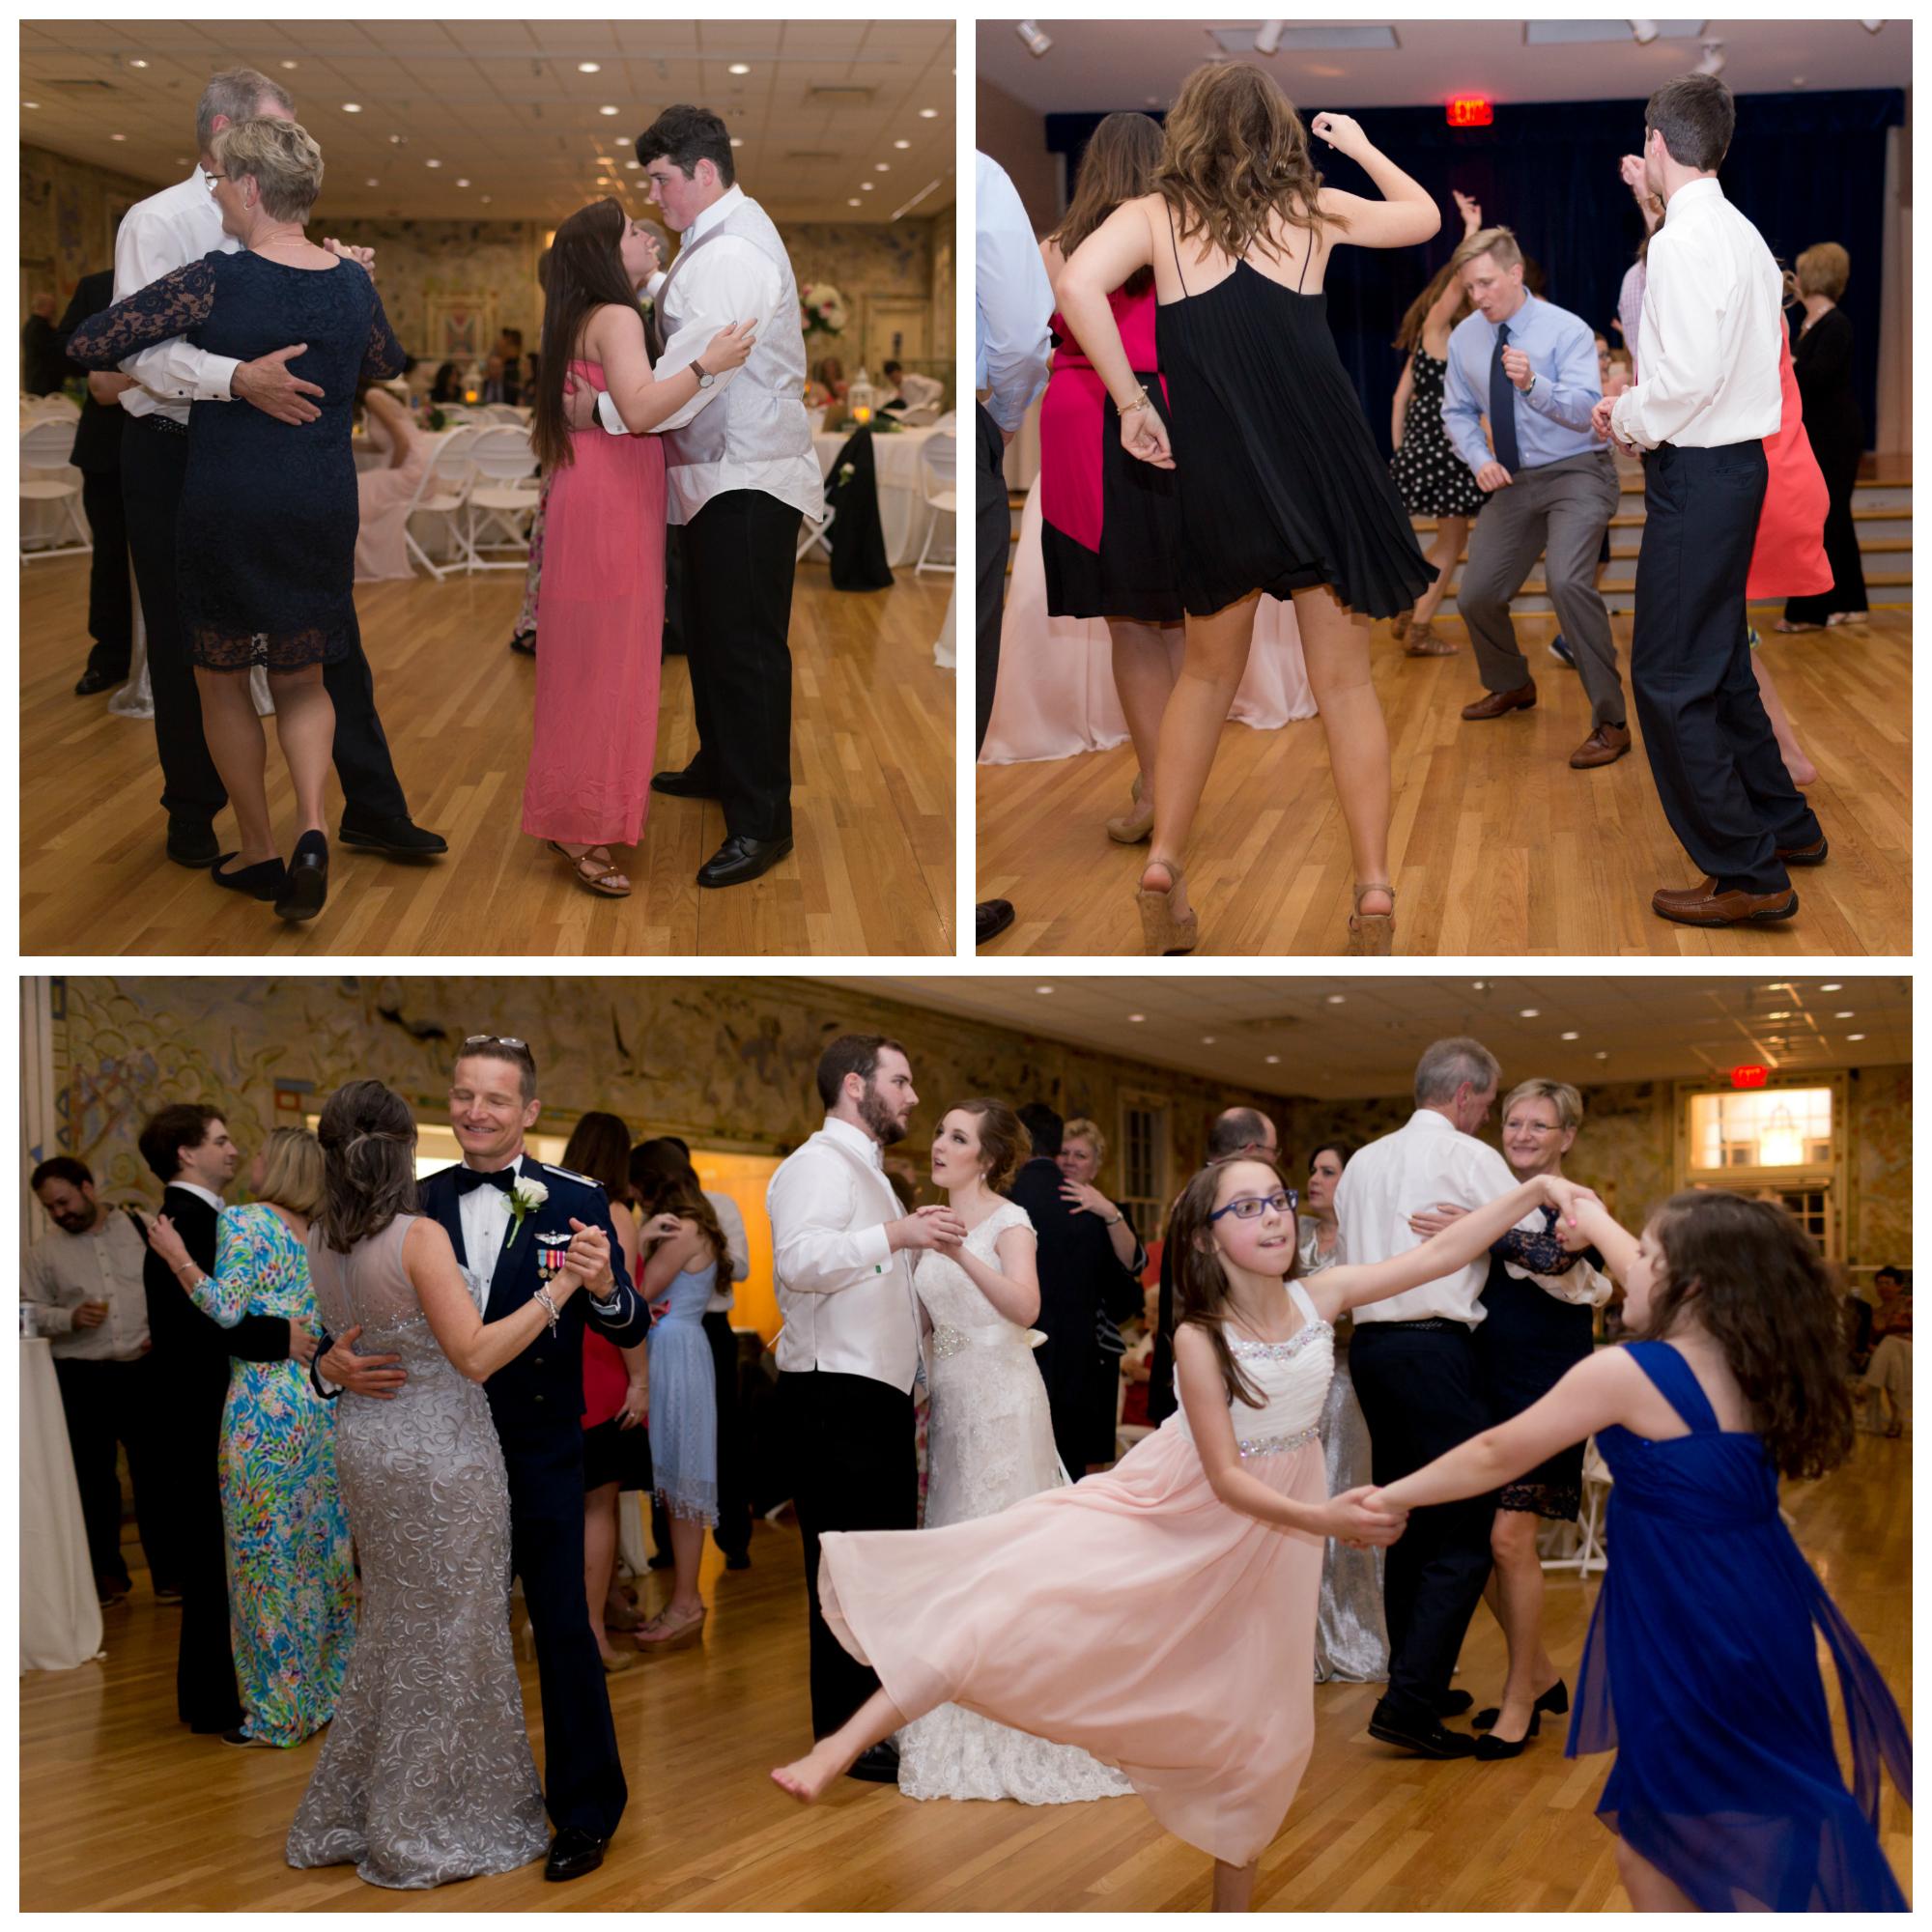 wedding reception dancing at Ocean Springs Community Center